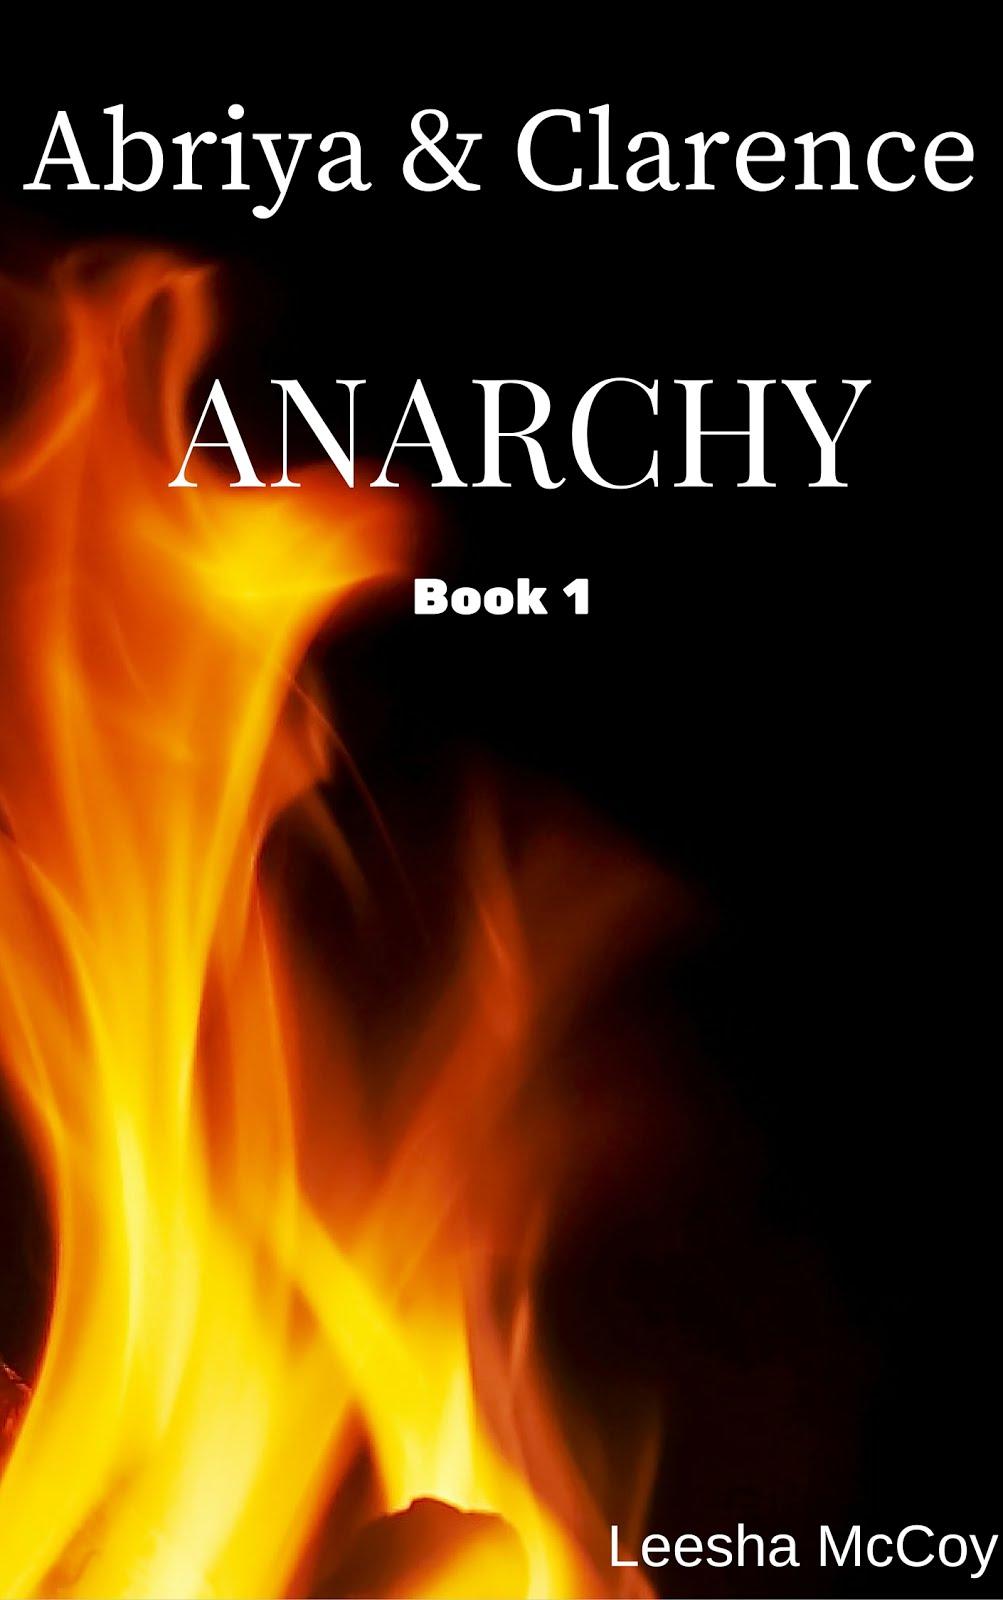 Anarchy (Abriya & Clarence #3)